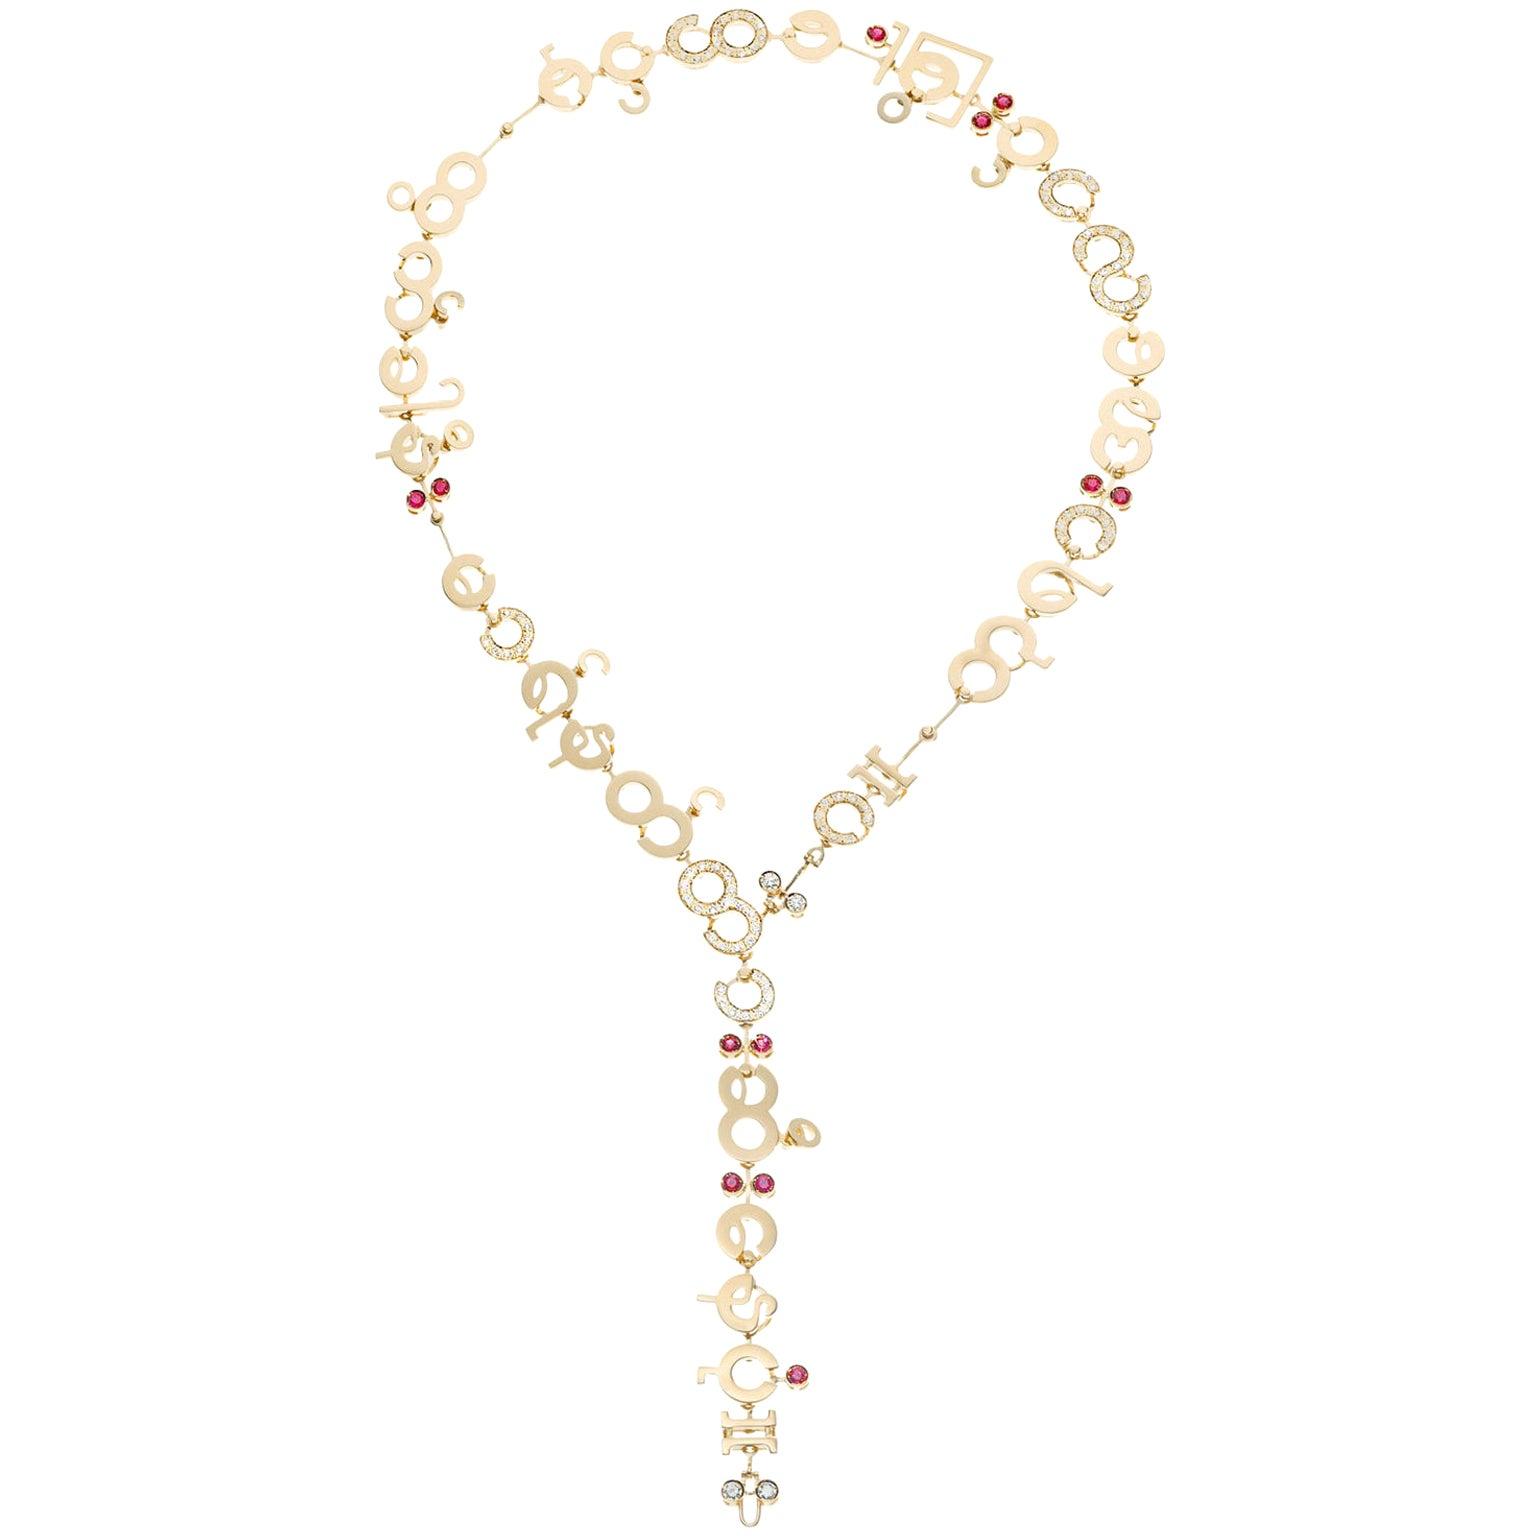 Nathalie Jean Contemporary 2.32 Carat Diamond 1.2 Carat Ruby Gold Drop Necklace